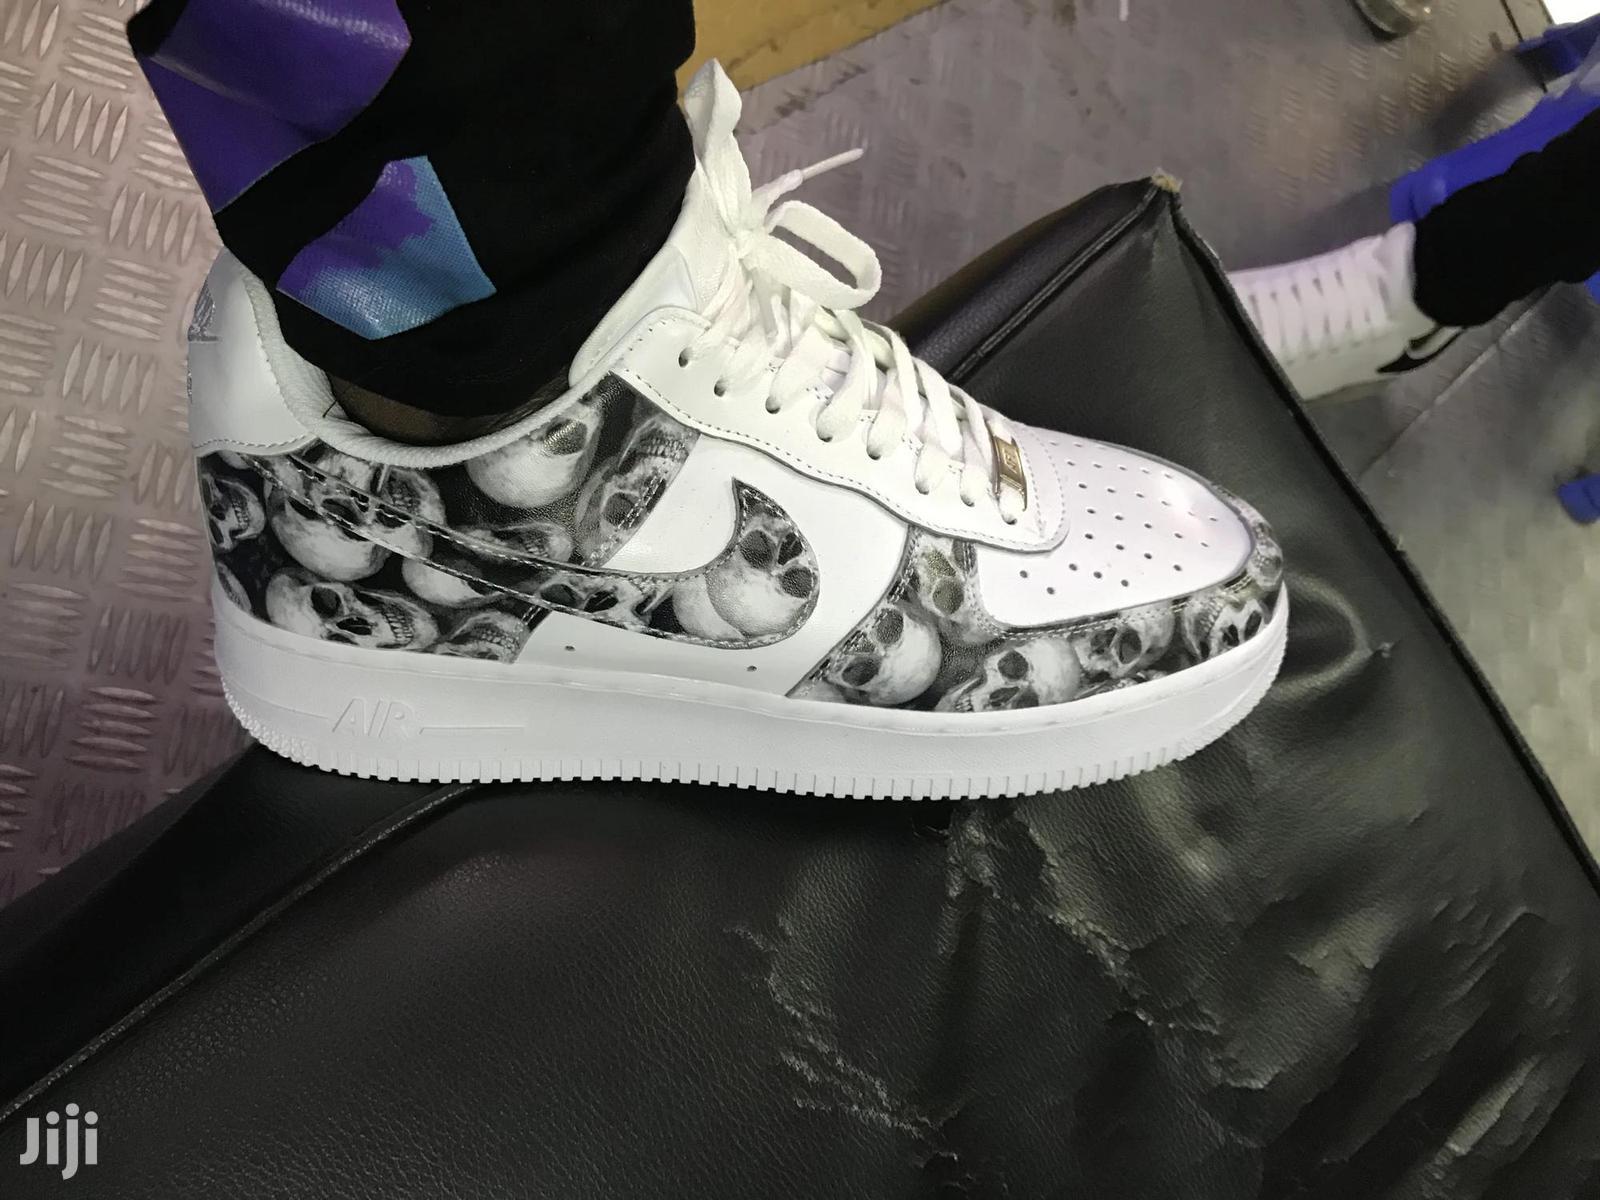 Skull Printed Airforce | Shoes for sale in Nairobi Central, Nairobi, Kenya